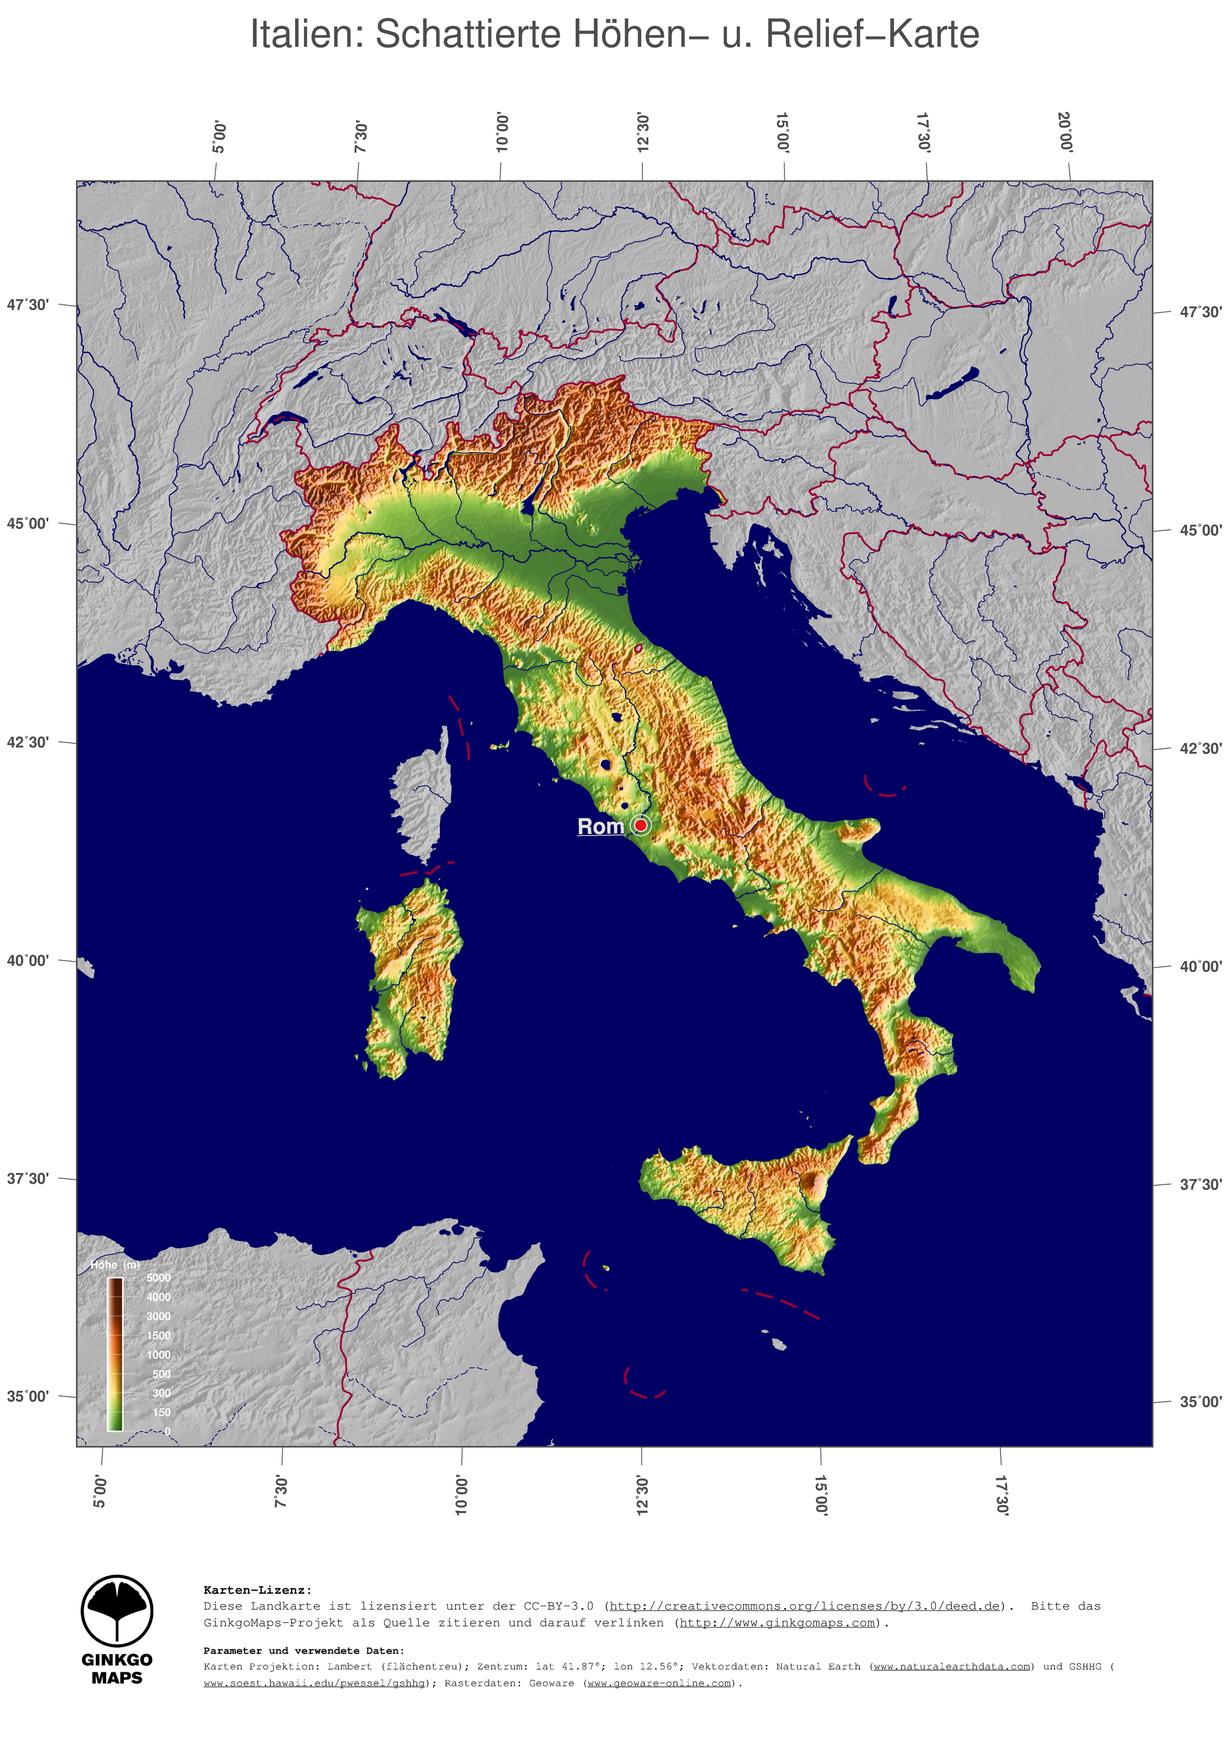 rl3c_it_italien_landkarte_illdtmcolgw30s_ja_mres